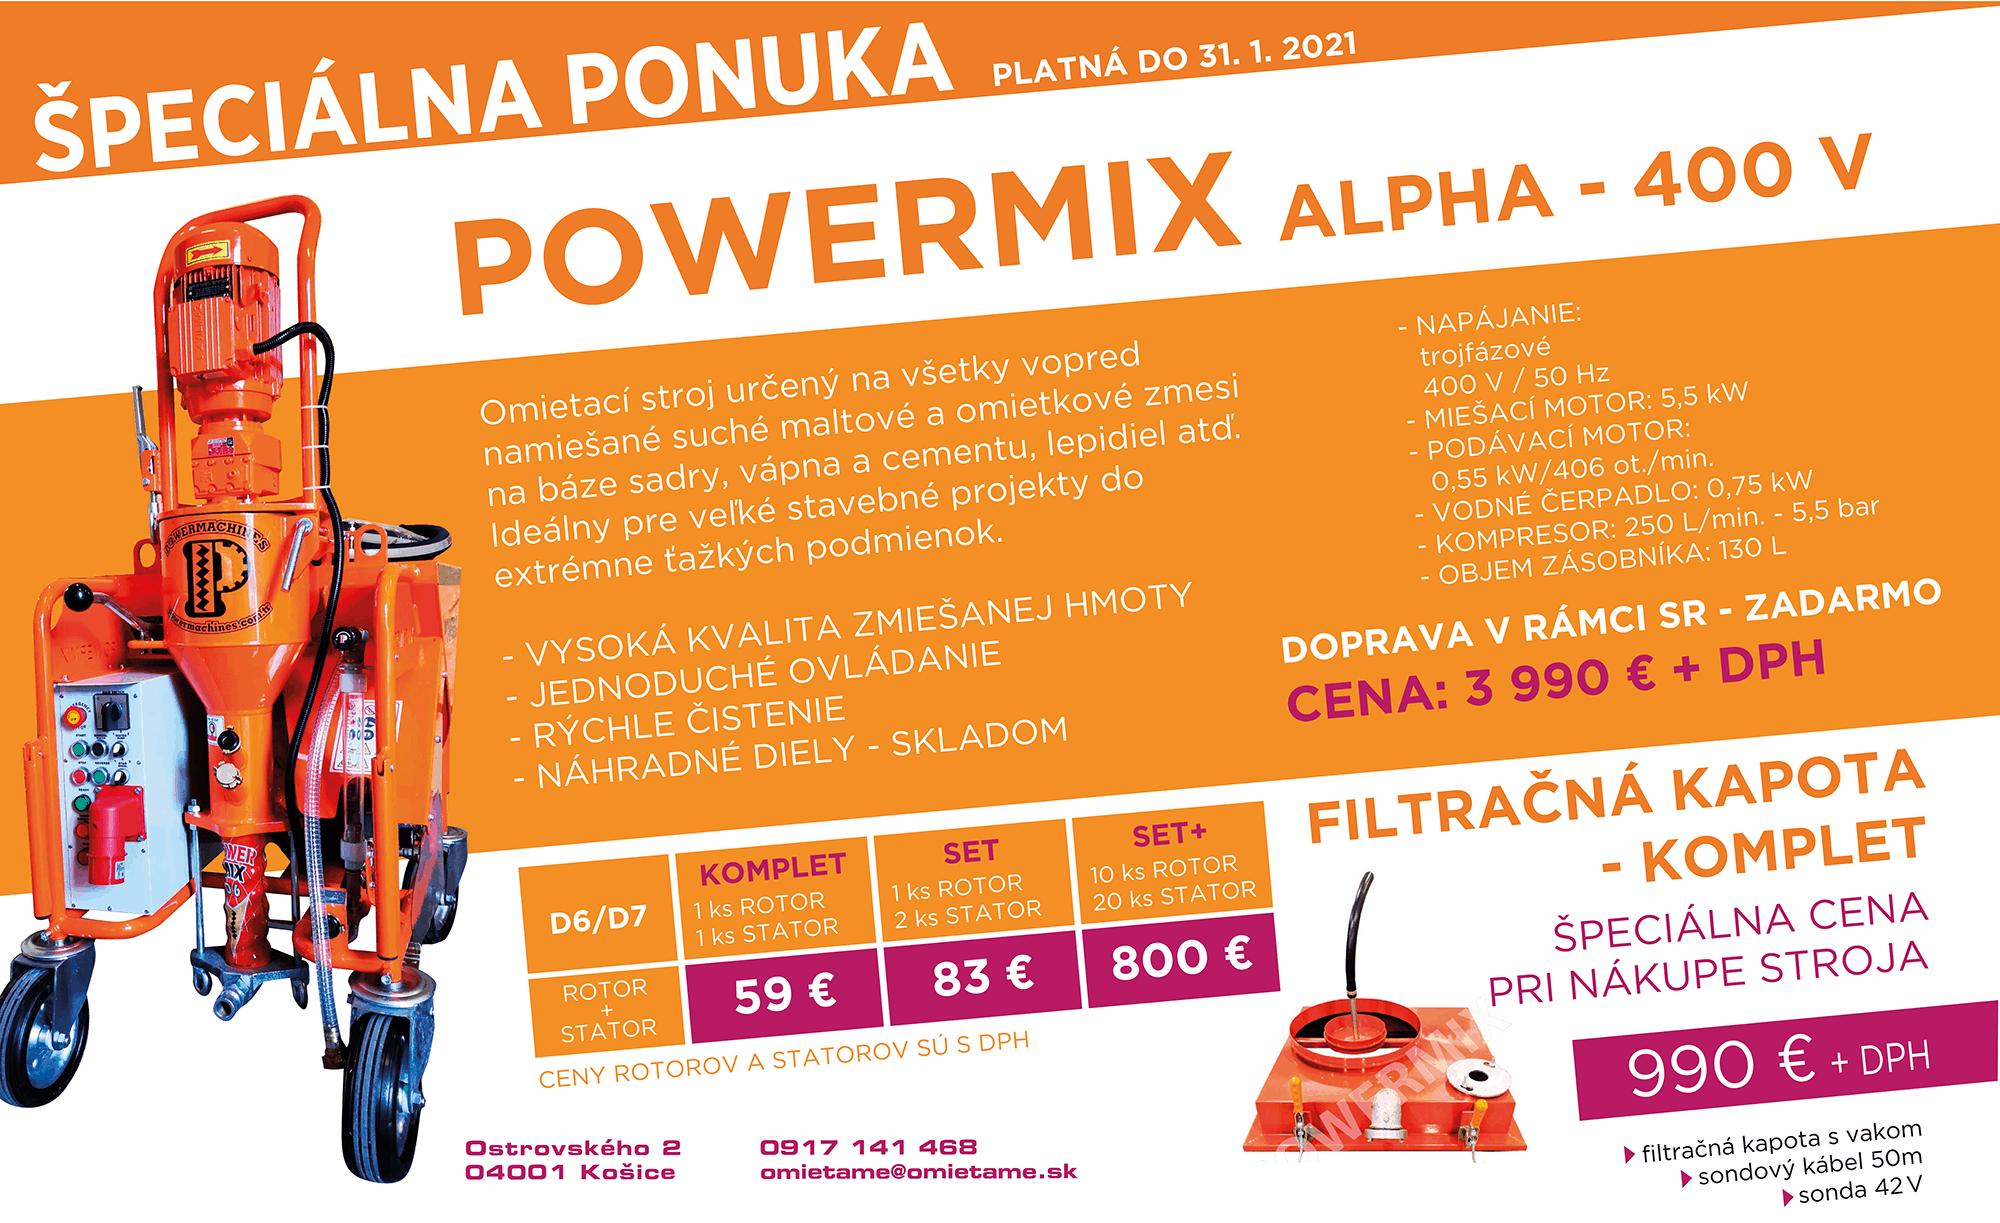 špeciálna ponuka Powermix - Omietací stroj